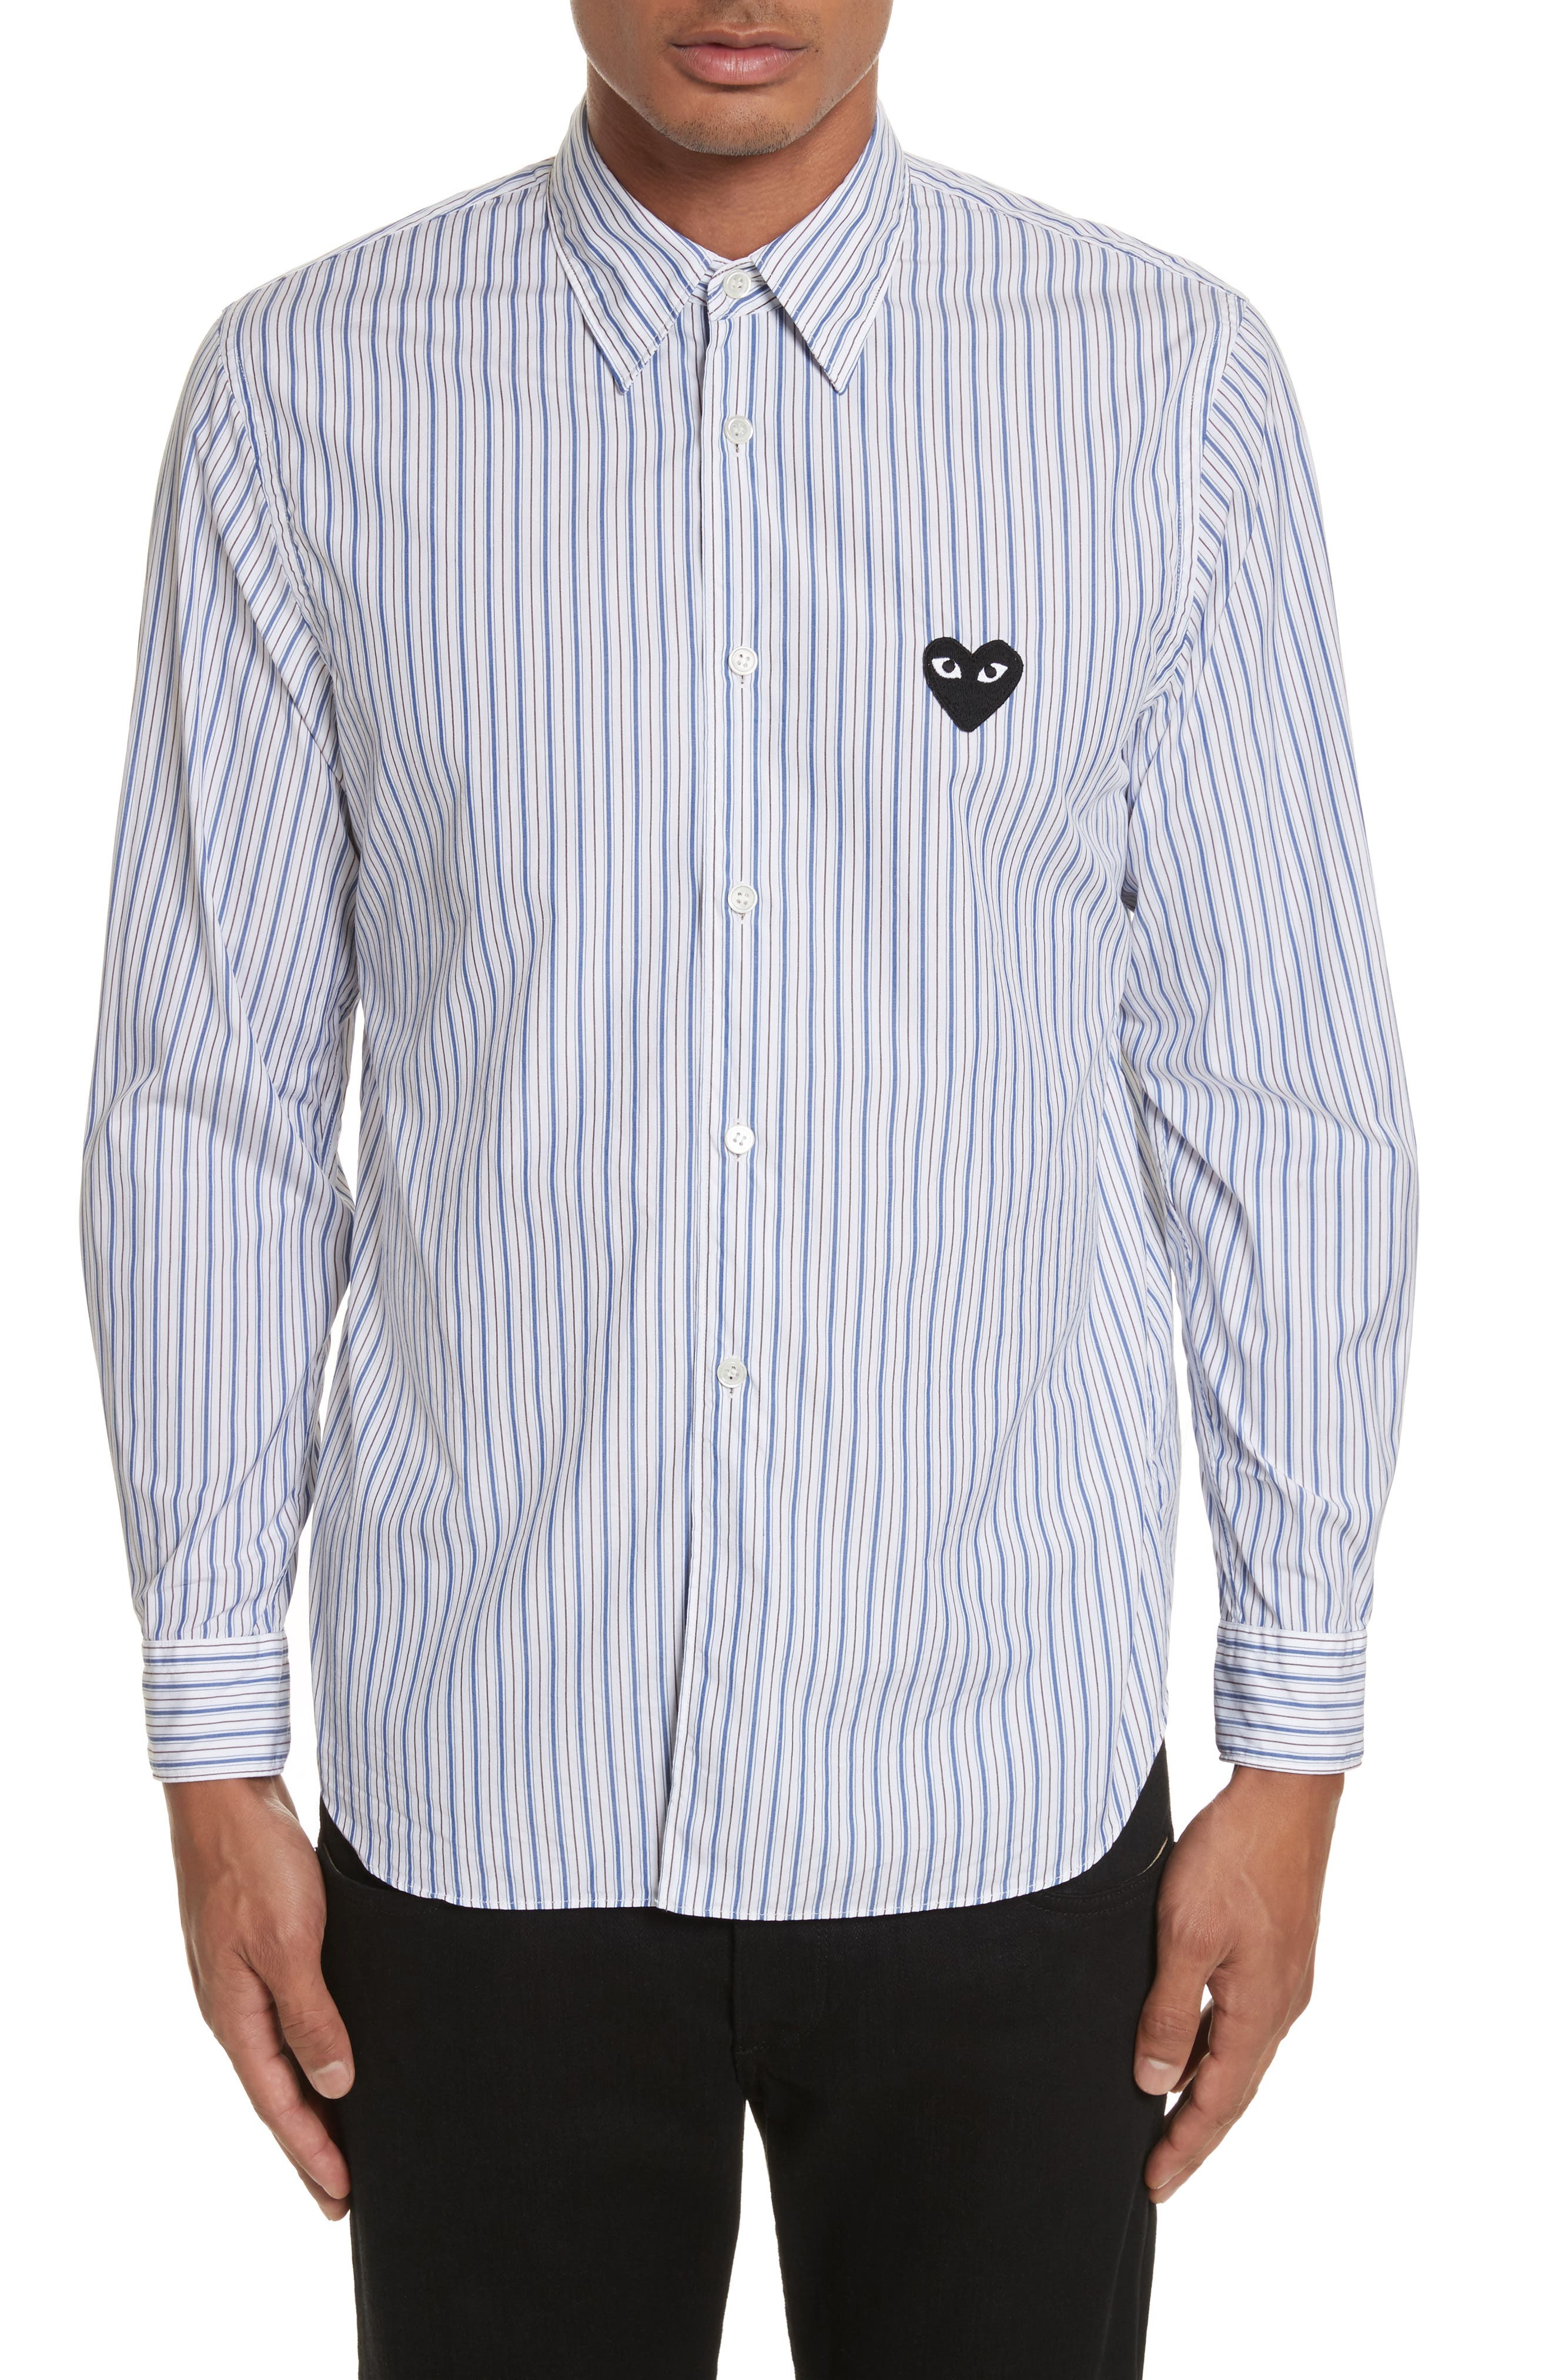 Main Image - Comme des Garçons PLAY Black Heart Stripe Oxford Shirt